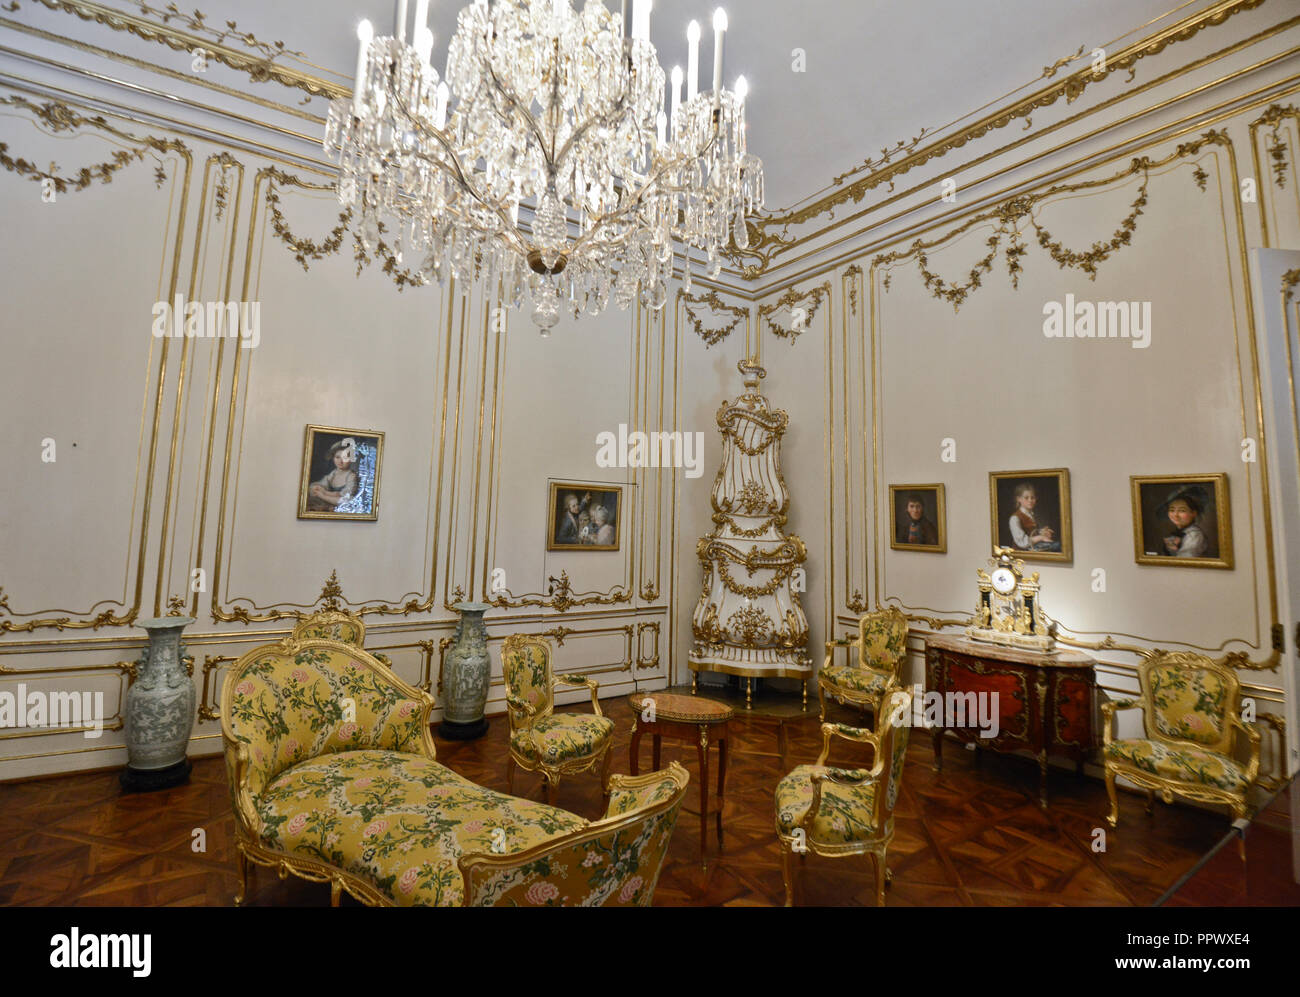 Schönbrunn Palace, interior of a room. Vienna, Austria - Stock Image